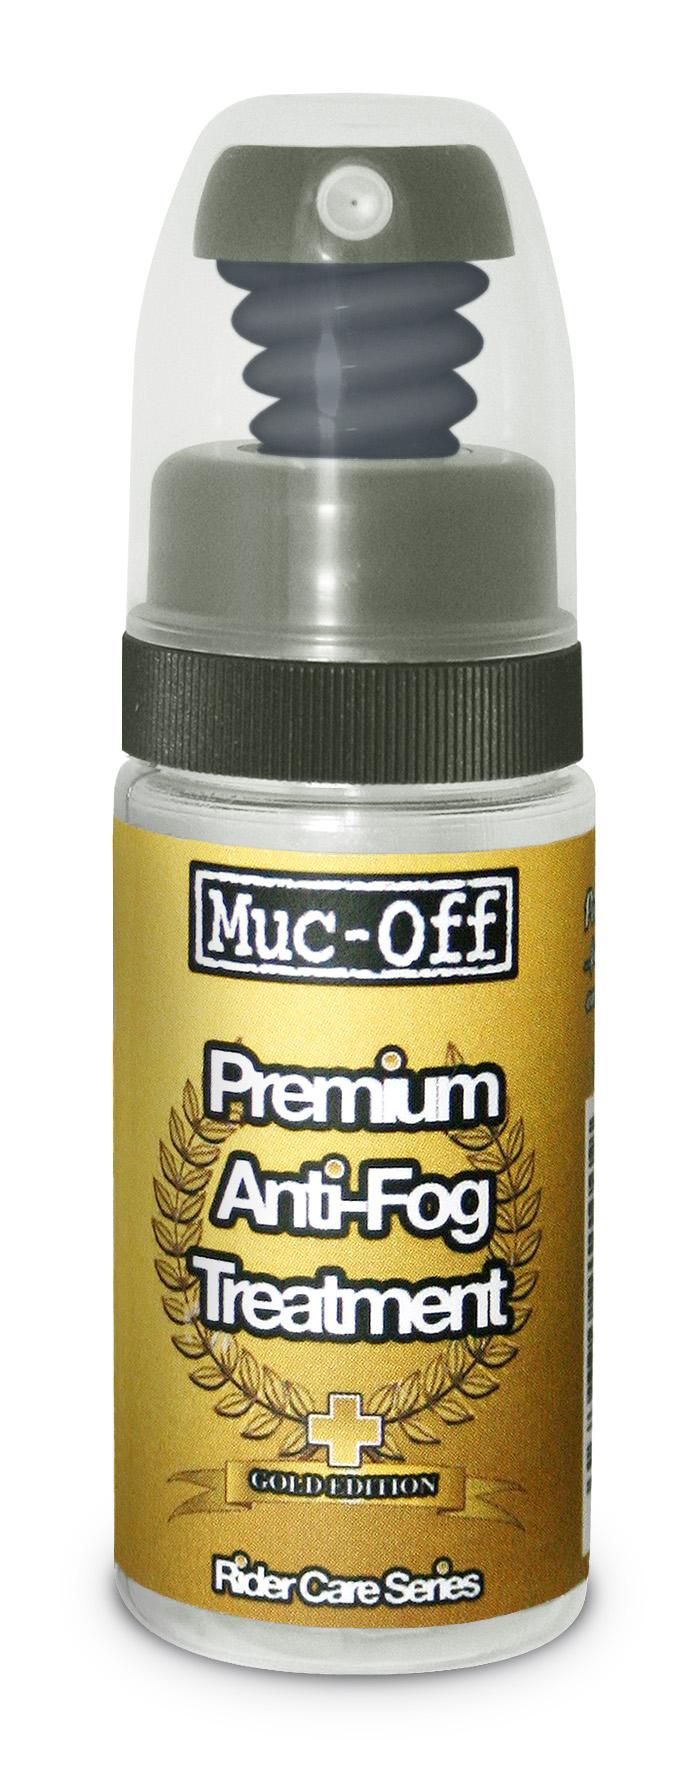 214 - Muc-Off Premium Anti-Fog Treatment 35ml.jpg